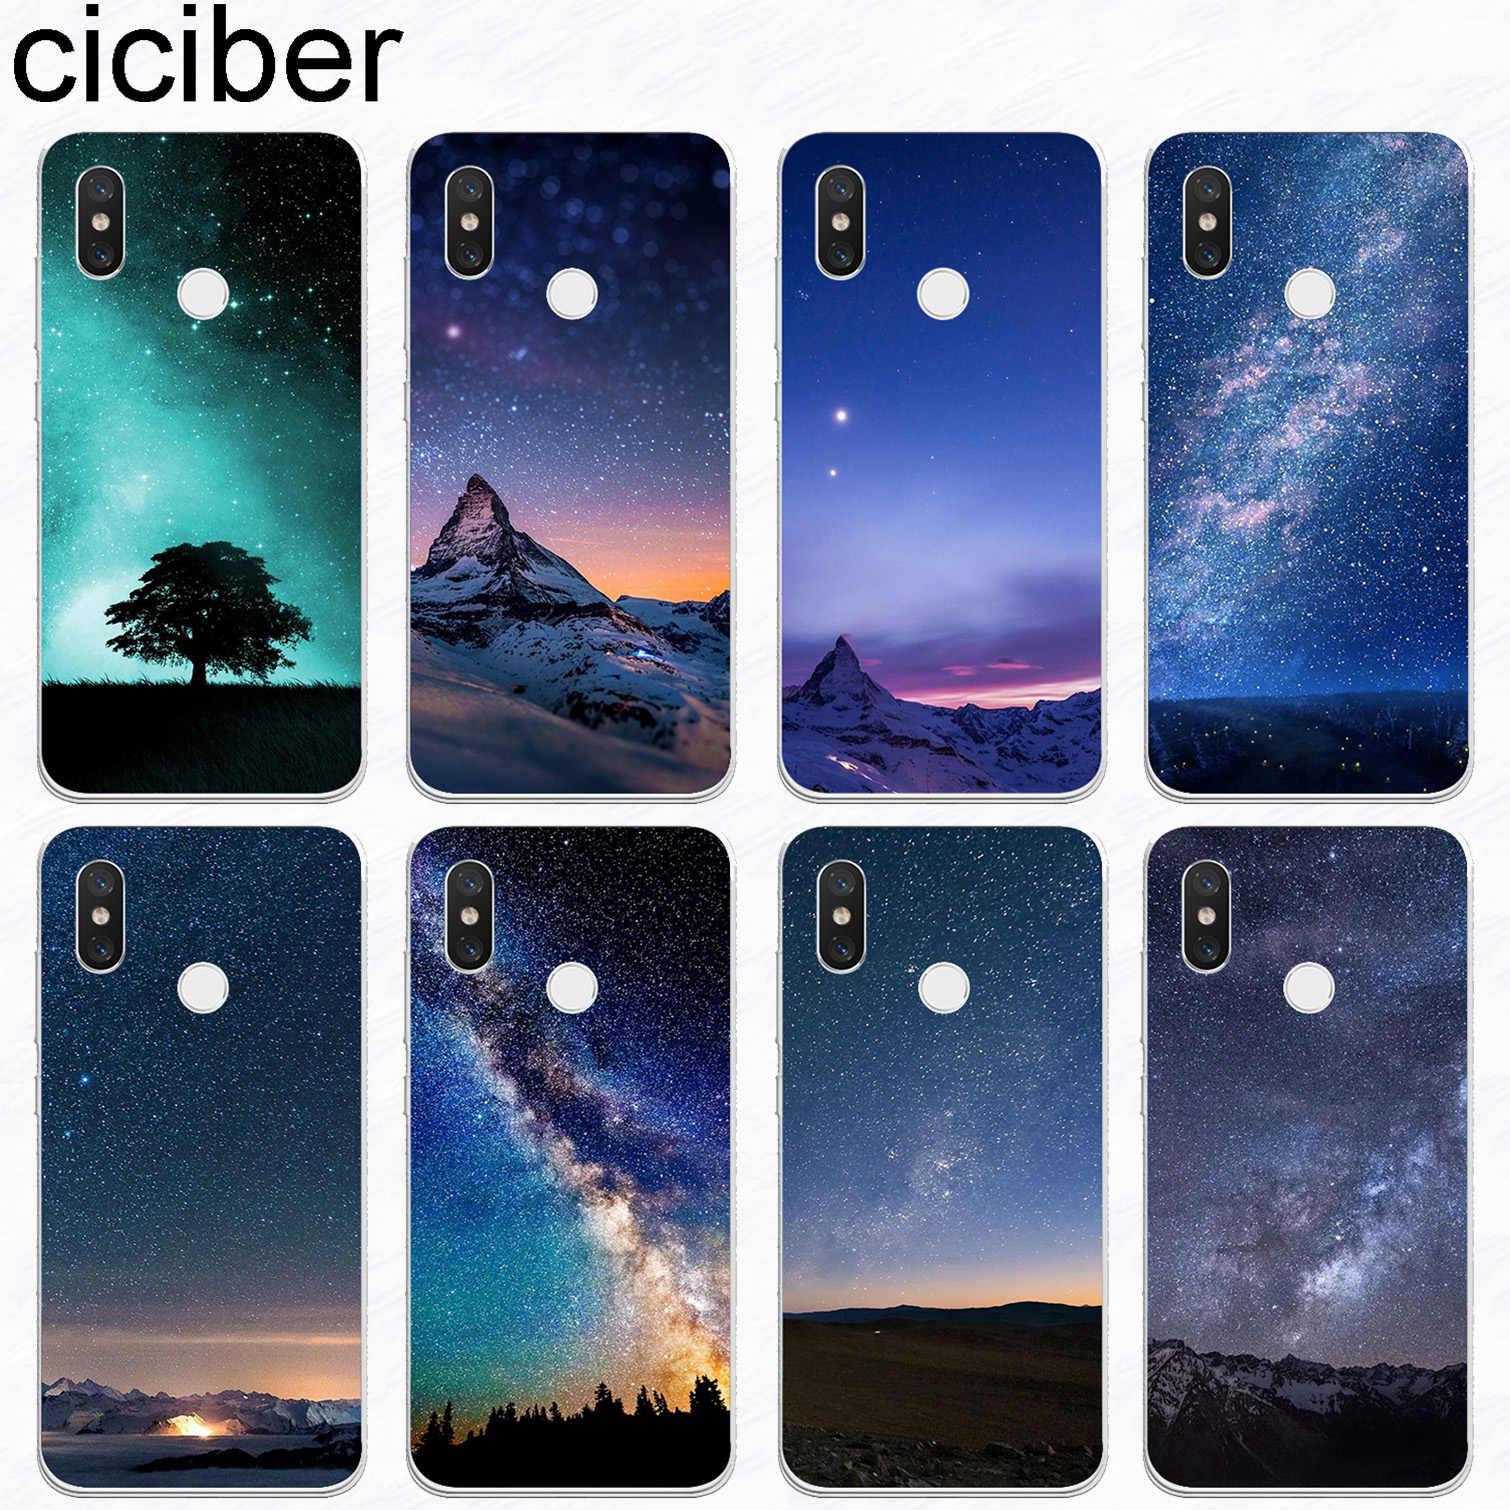 ciciber Northern Lights For Xiaomi A2 A1 8 6 5 X 5C 5S Plus Lite SE Poco Phone F1 Soft TPU Cases For Xiaomi MIX MAX 3 2 1 S Pro